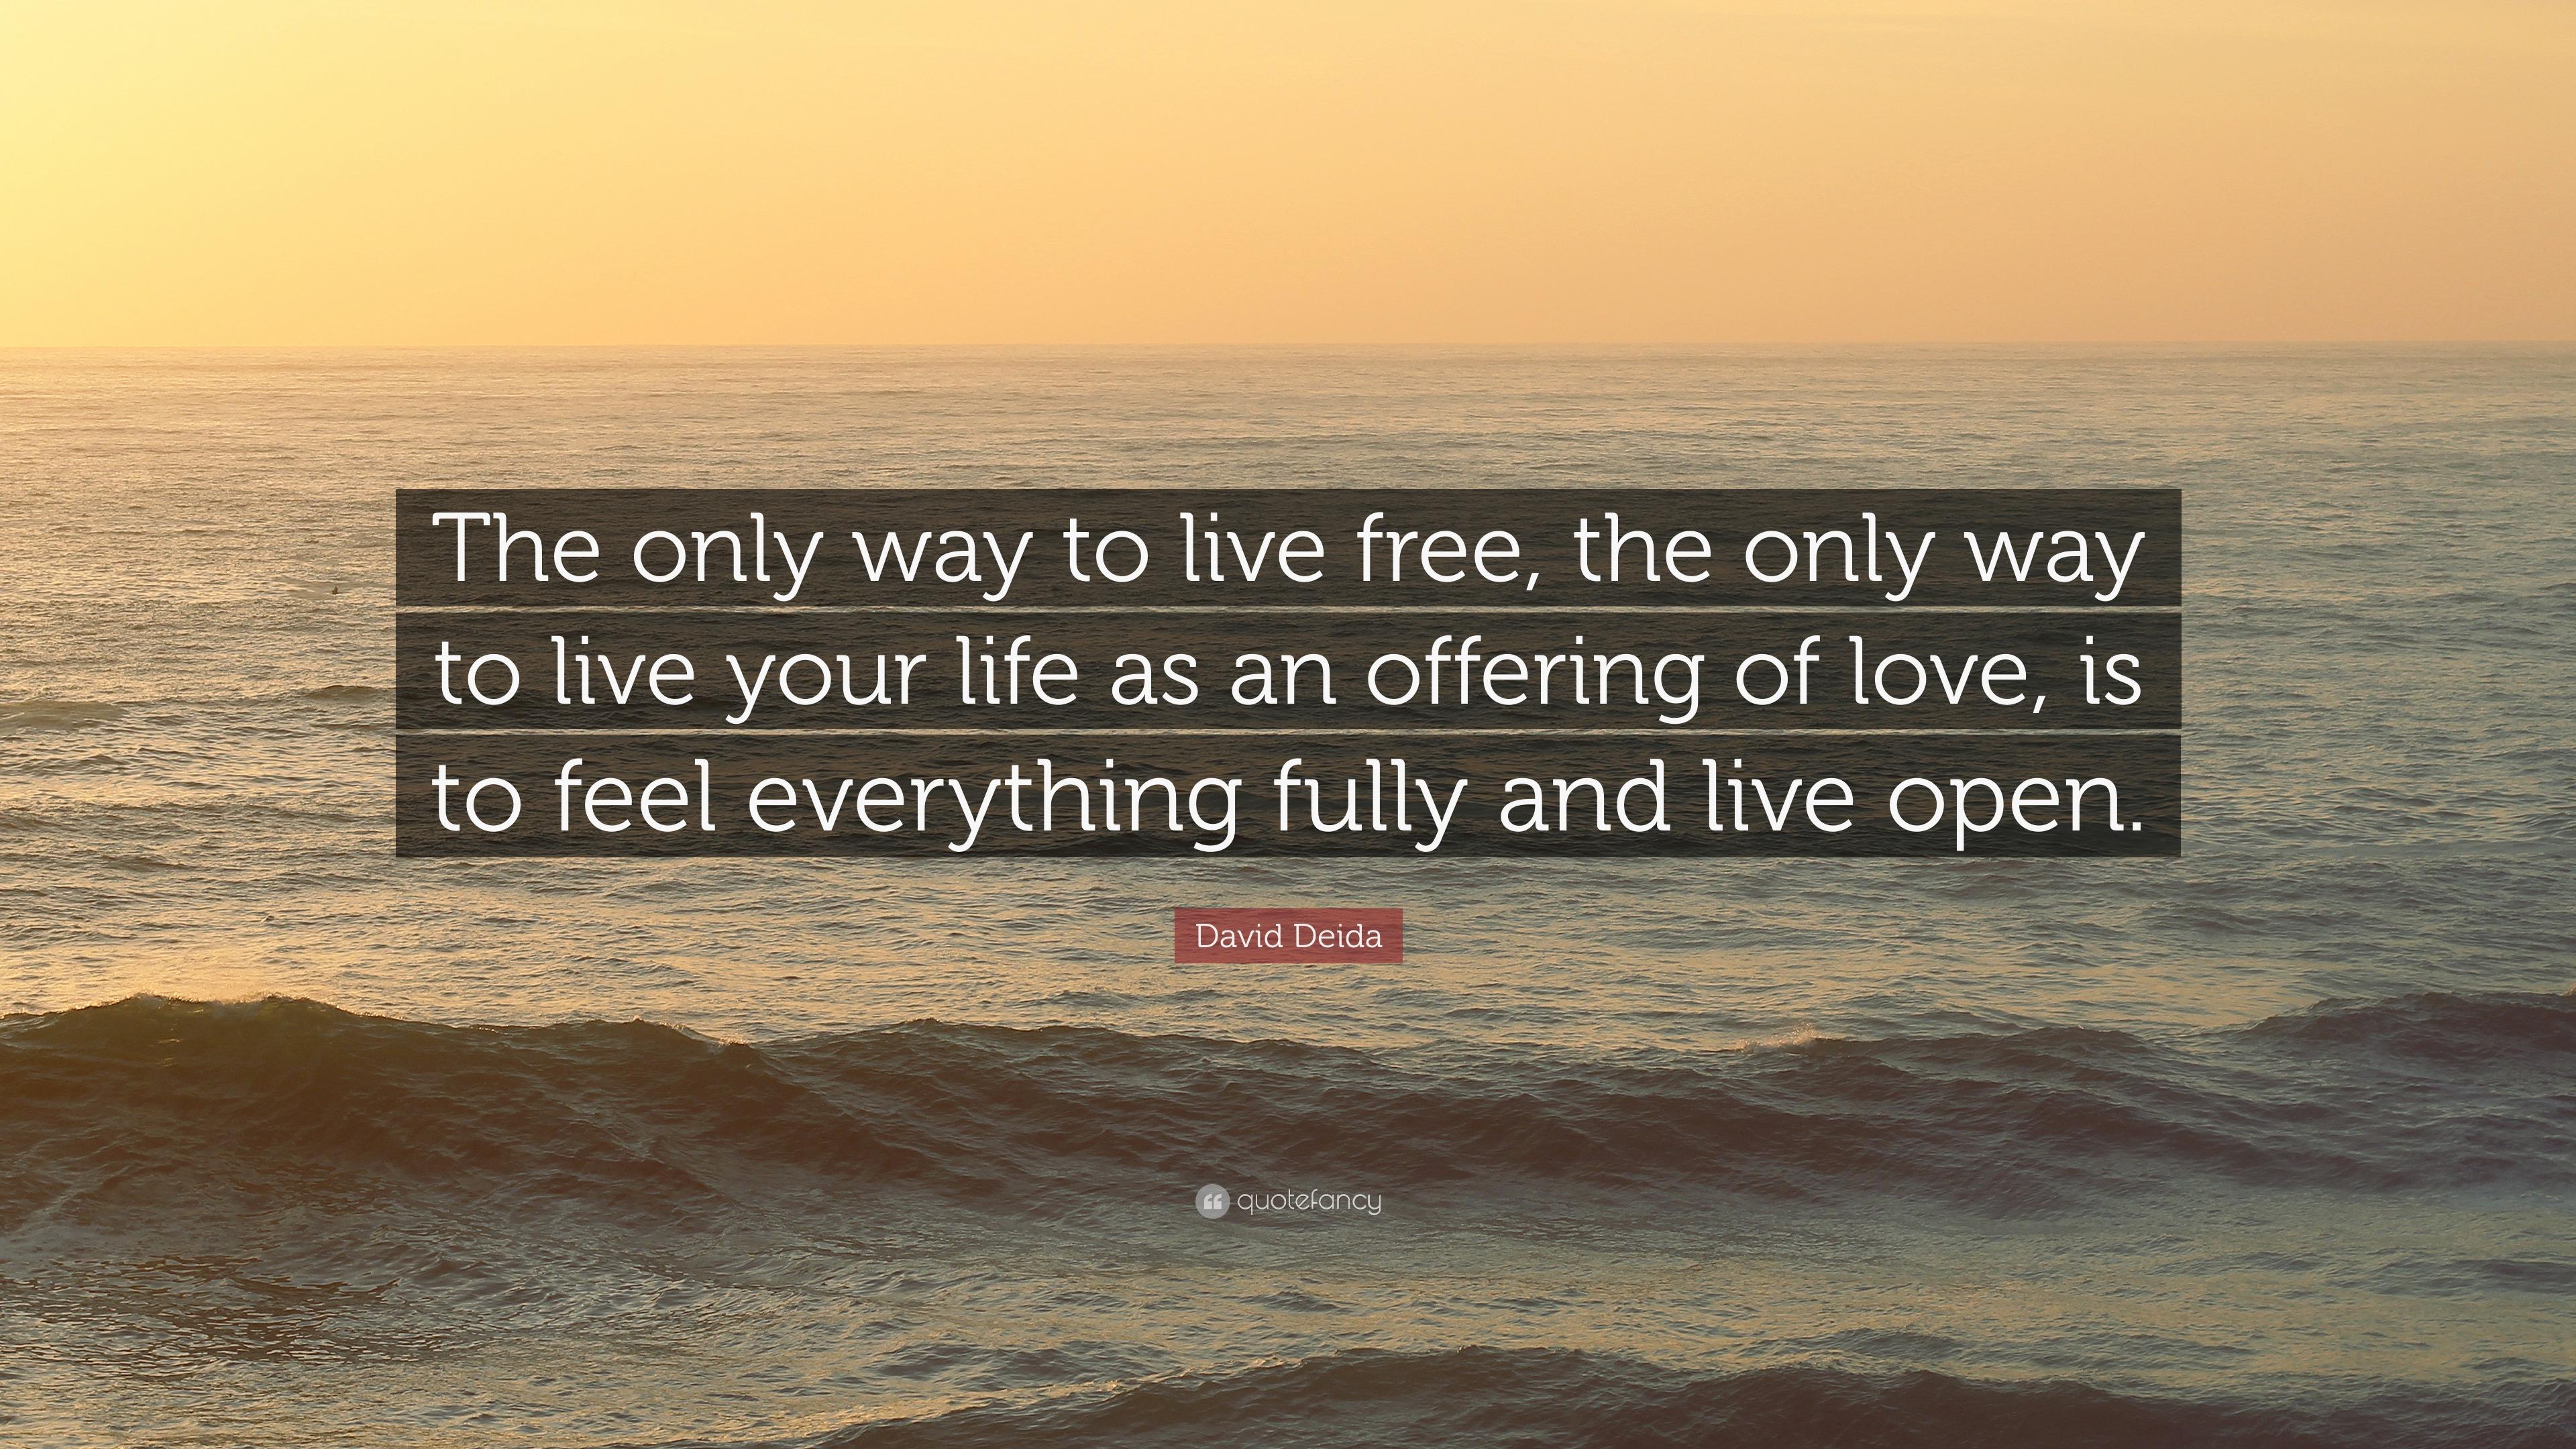 David Deida Quotes (51 wallpapers) - Quotefancy